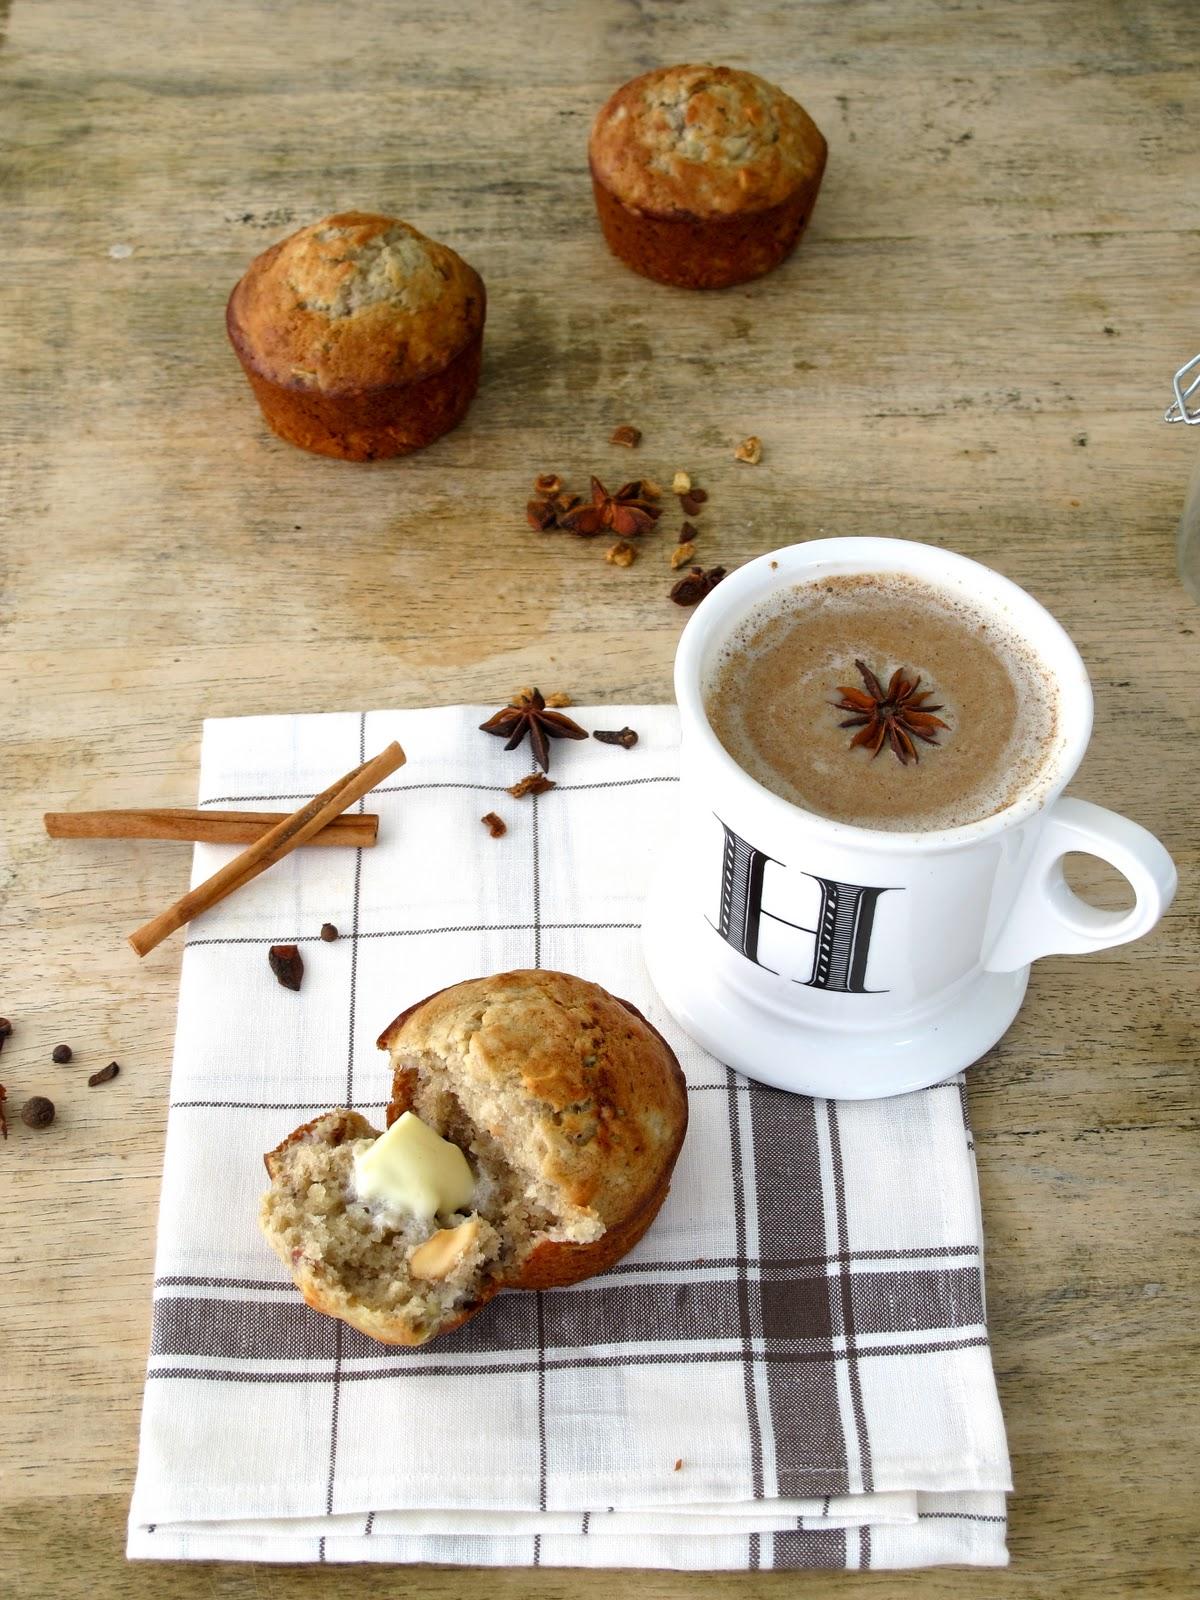 ... Hobick: Banana Nut Muffins | Homemade Banana Nut Muffin Recipe